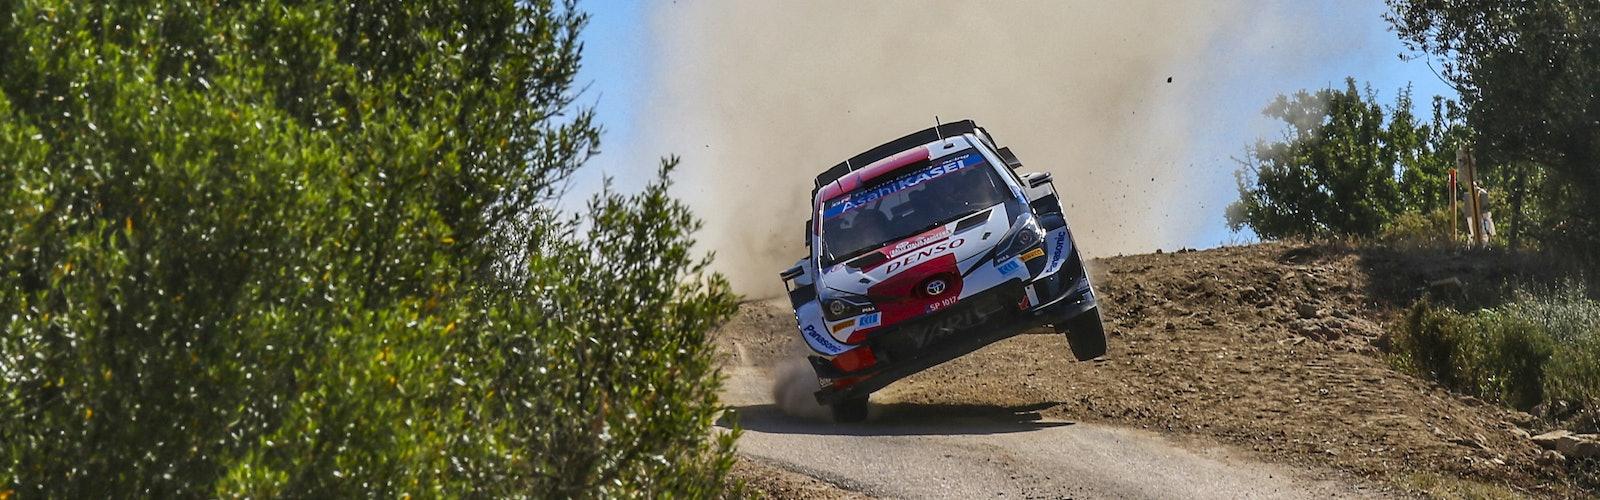 WRC_2021_Rd.5_092